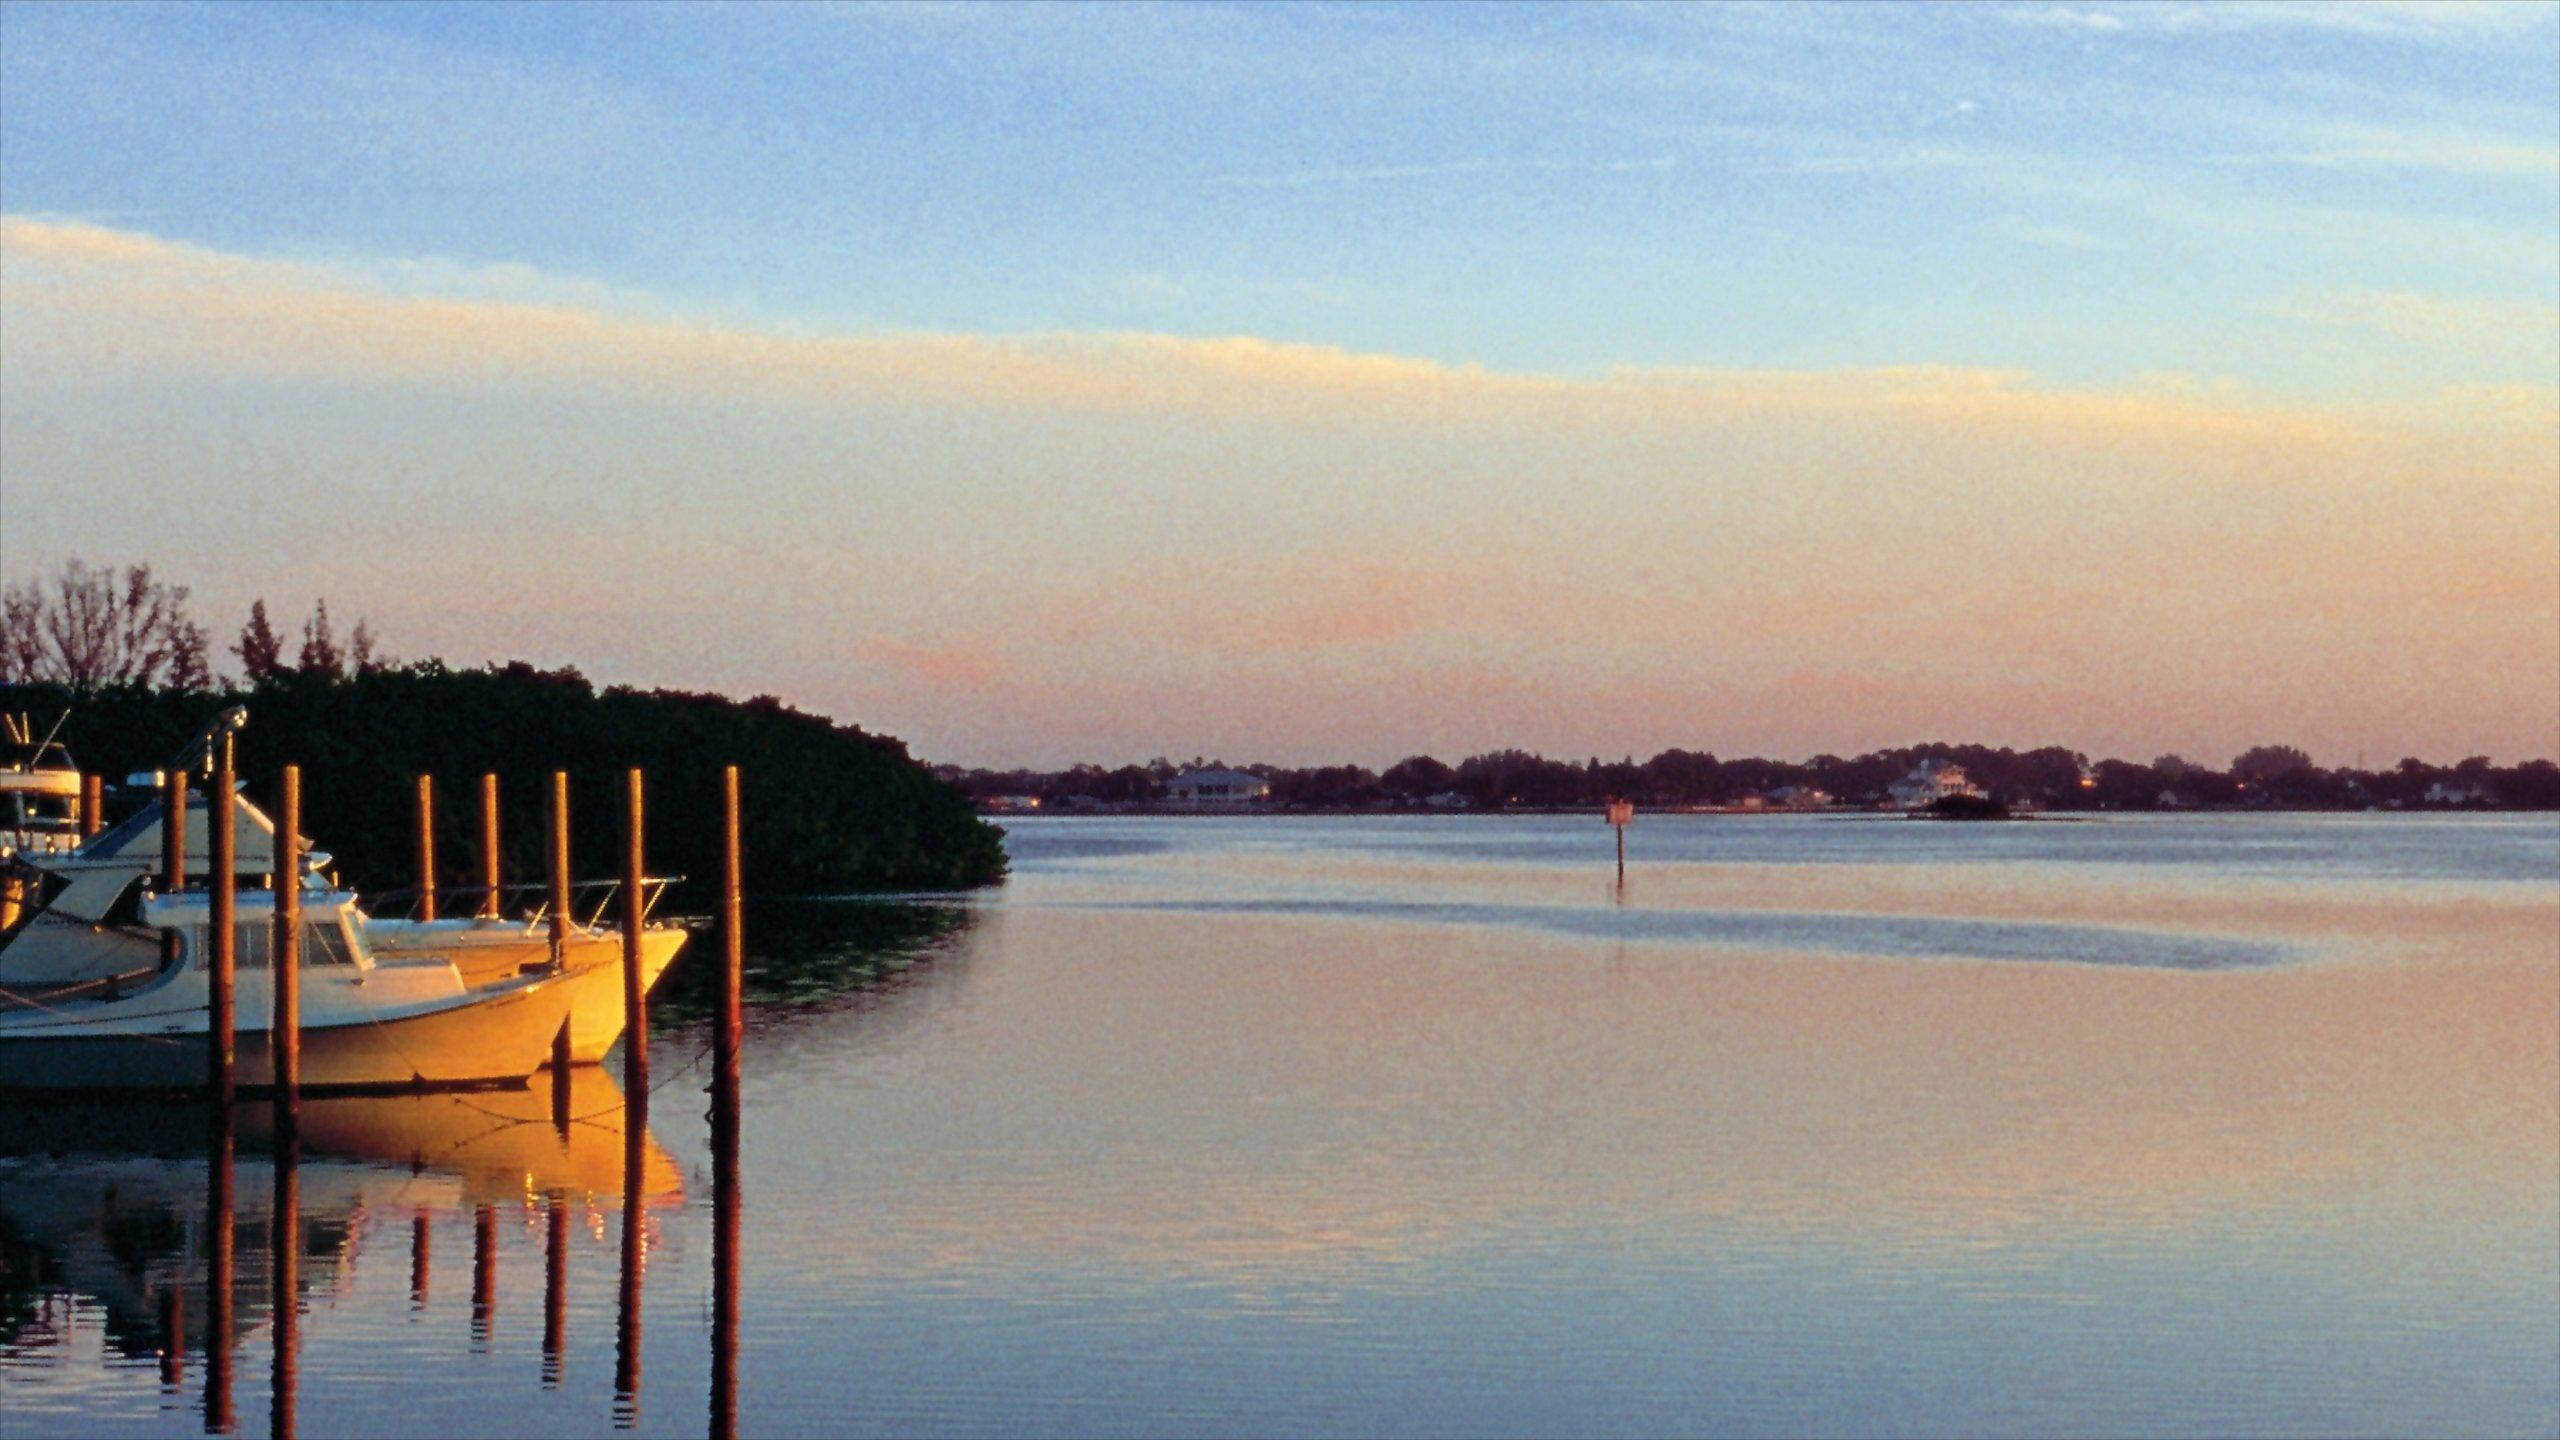 Port Charlotte - Charlotte Harbor (und Umgebung), Florida, USA